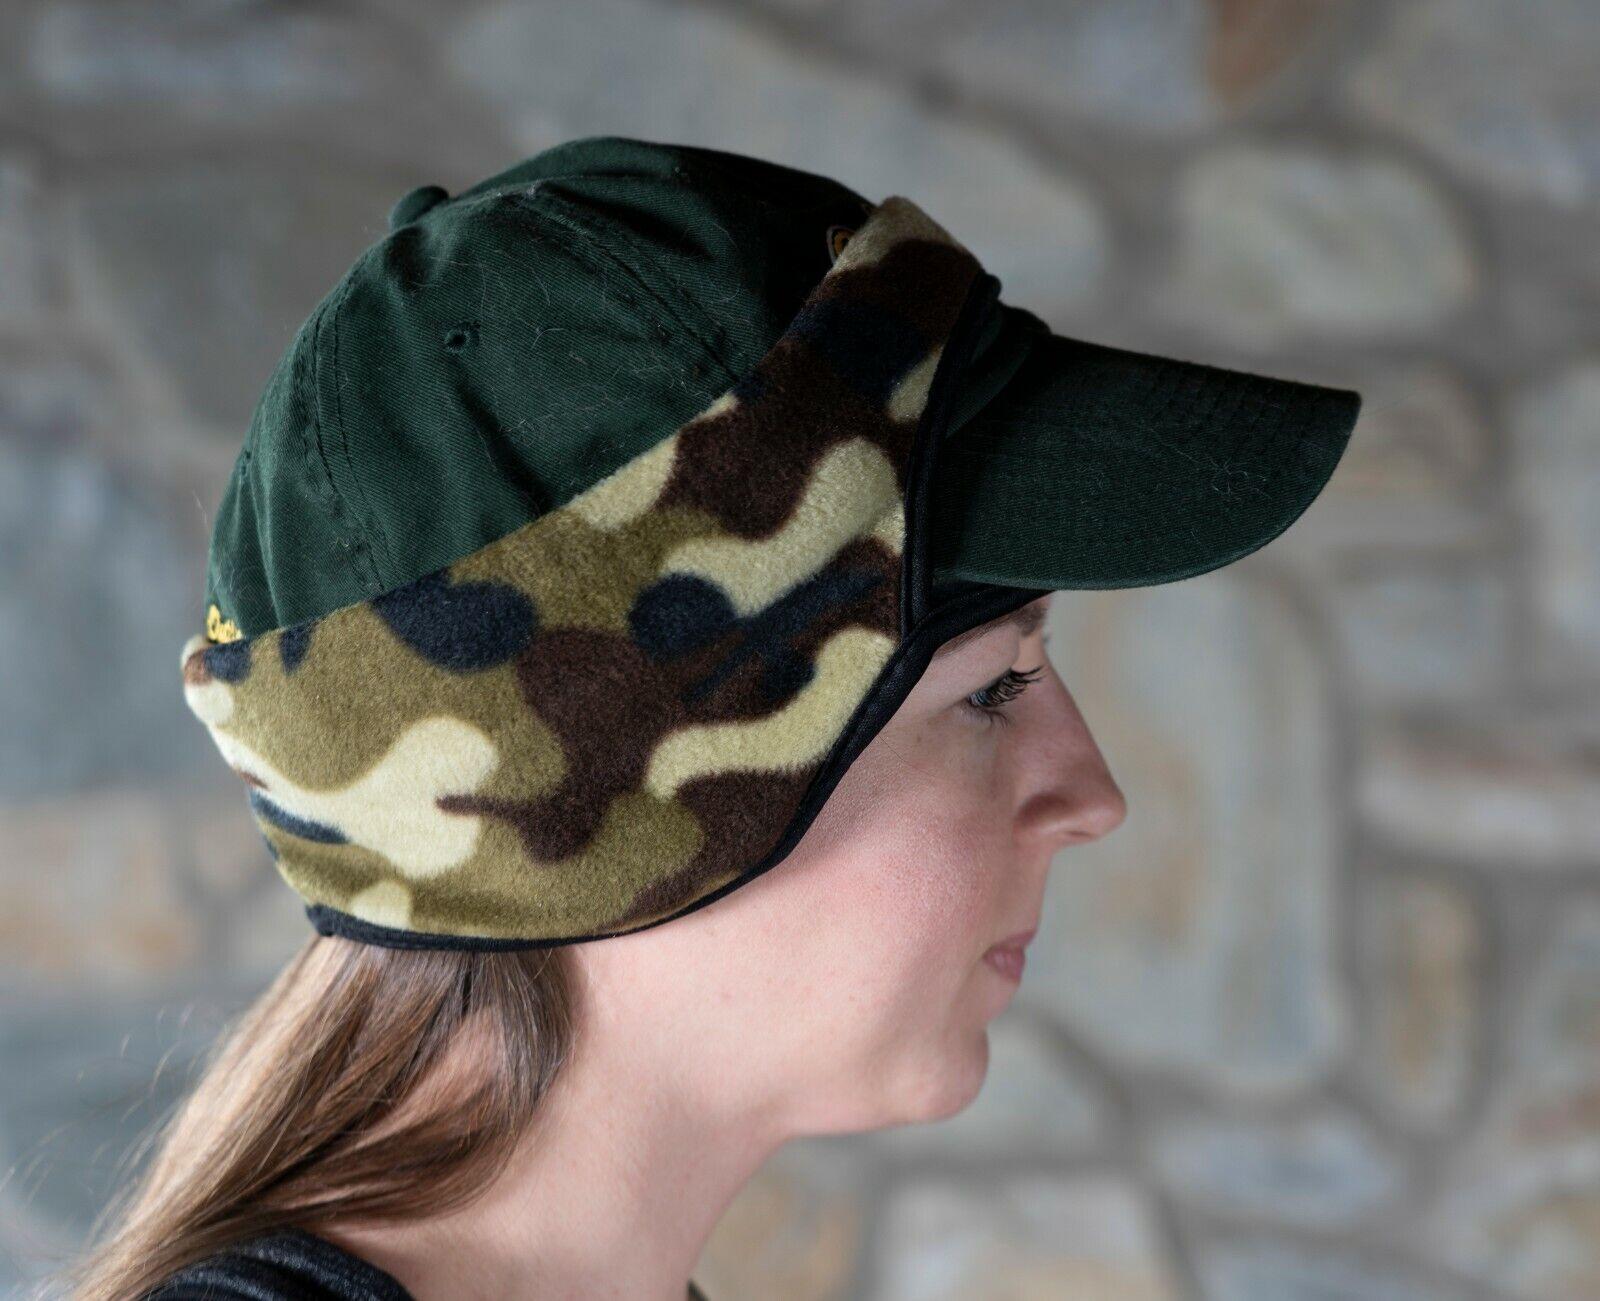 Baseball CAP Fleece EARs Forehead BAND – CAMOUFLAGE Green New earband Headband Clothing, Shoes & Accessories